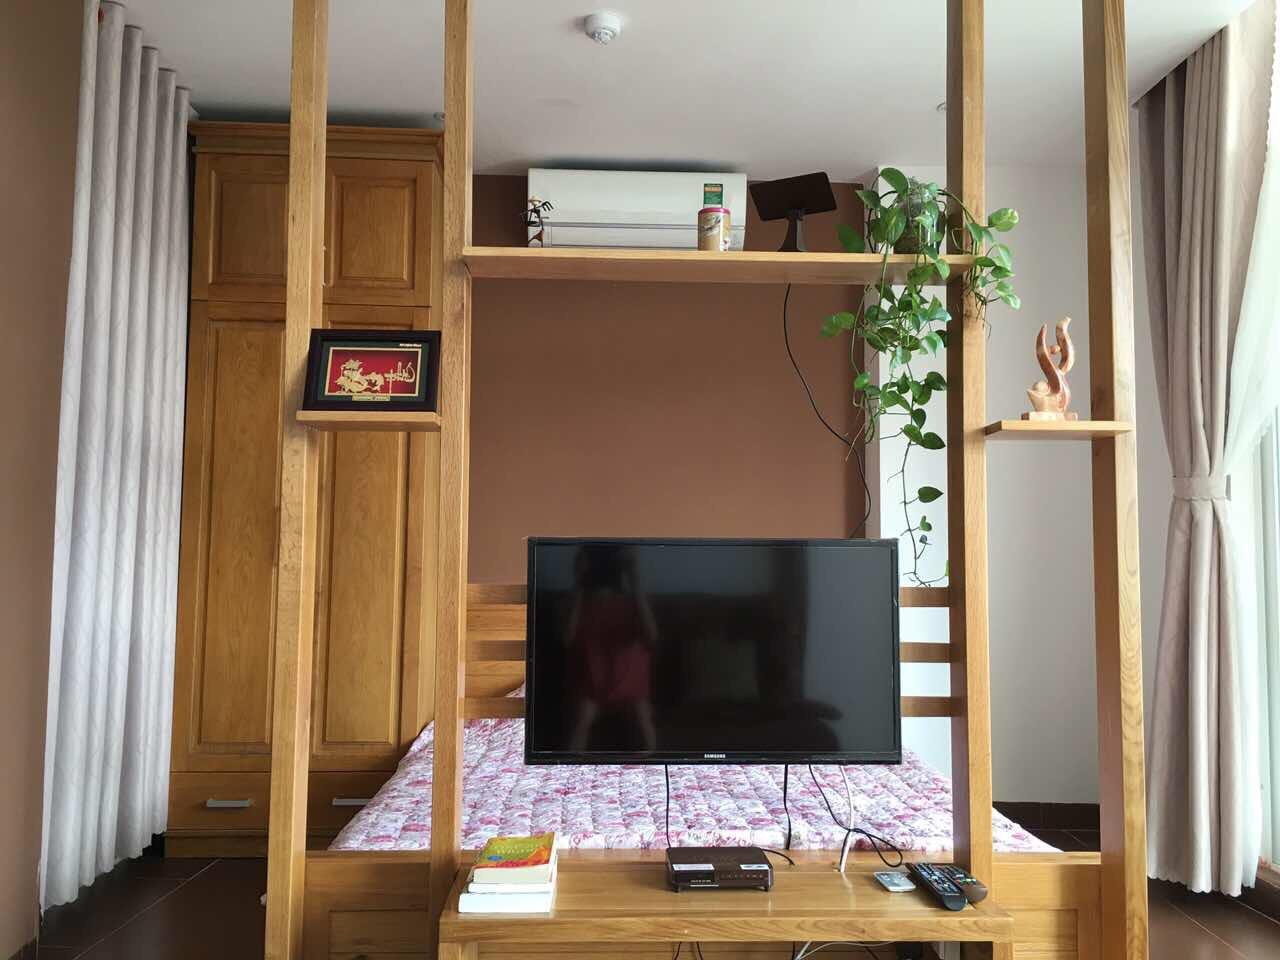 1 BEDROOM THUY TIEN APARTMENT VUNG TAU - $75.000 USD